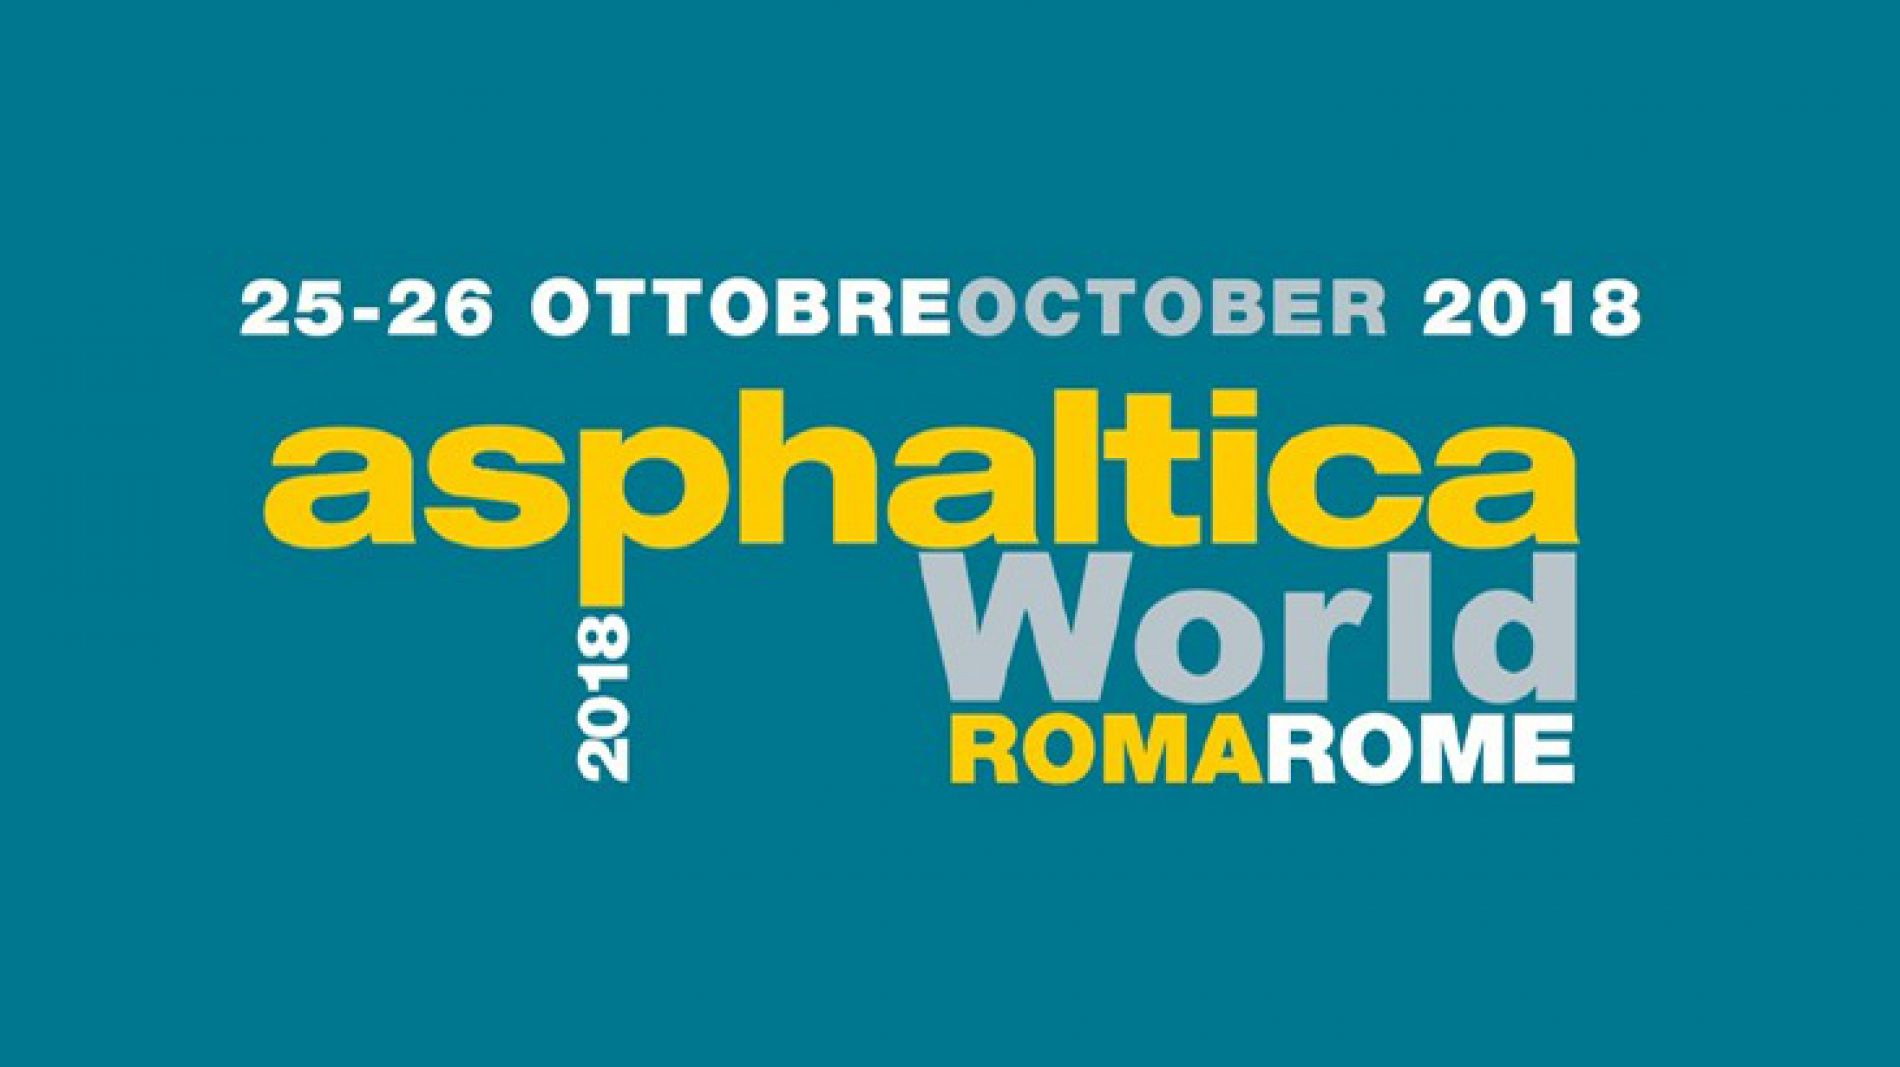 Asphaltica World a Roma